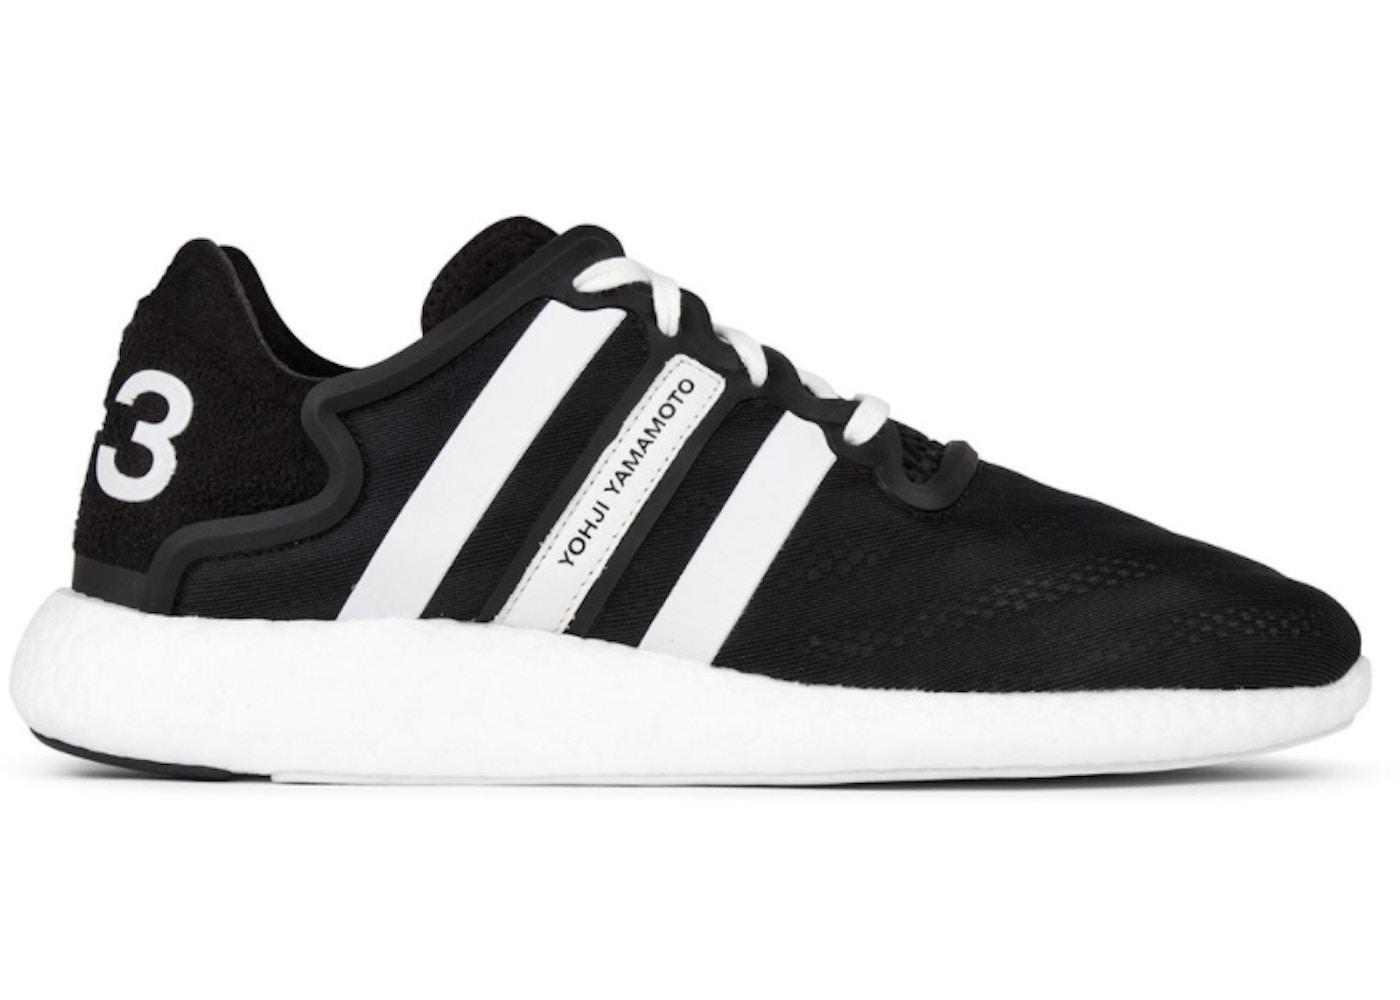 027ccc71d Y3 Run Boost Black White - S82118